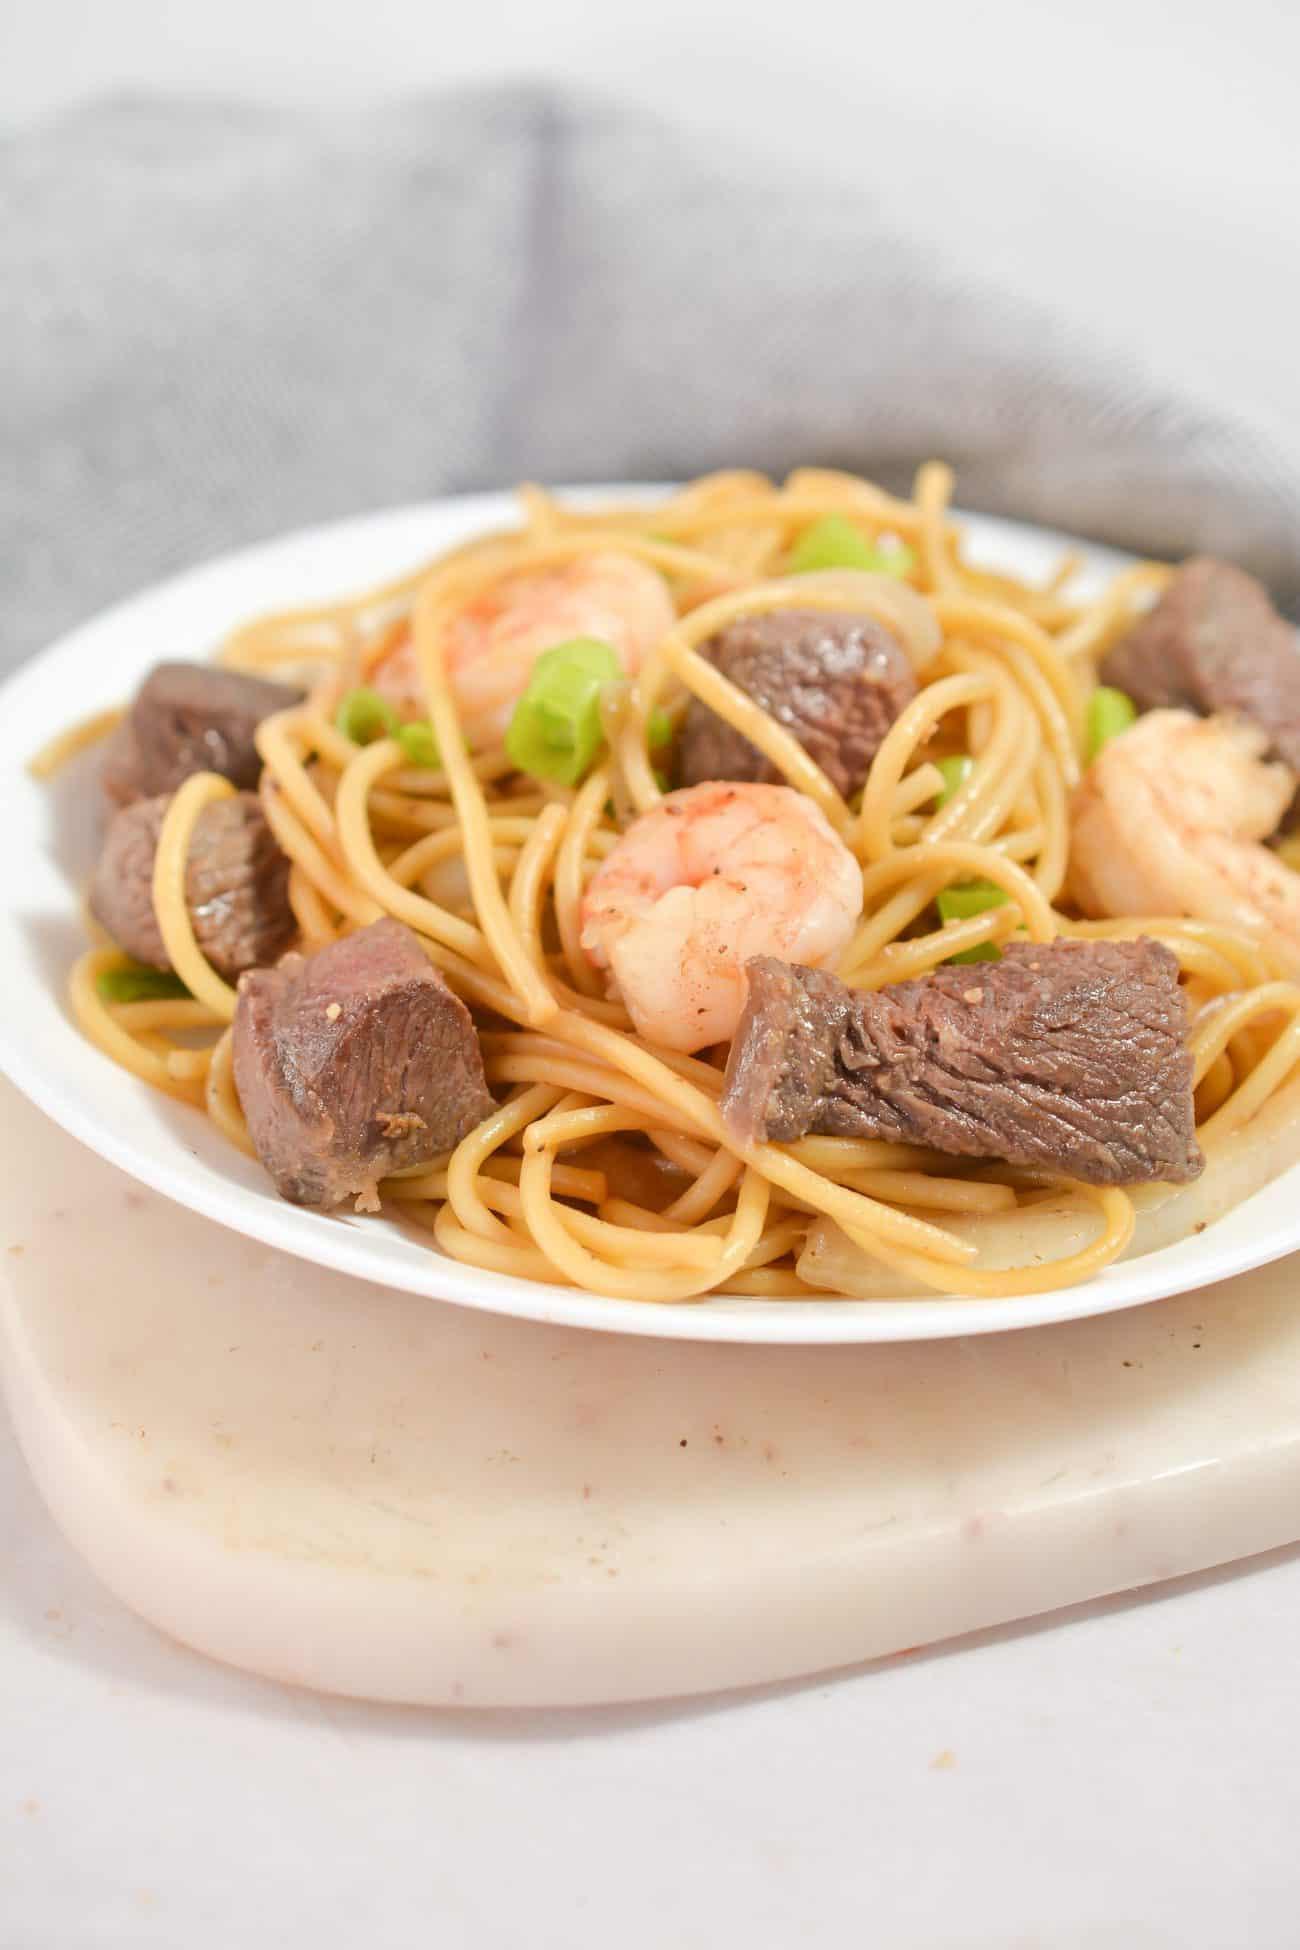 Steak and Shrimp Teriyaki Noodles